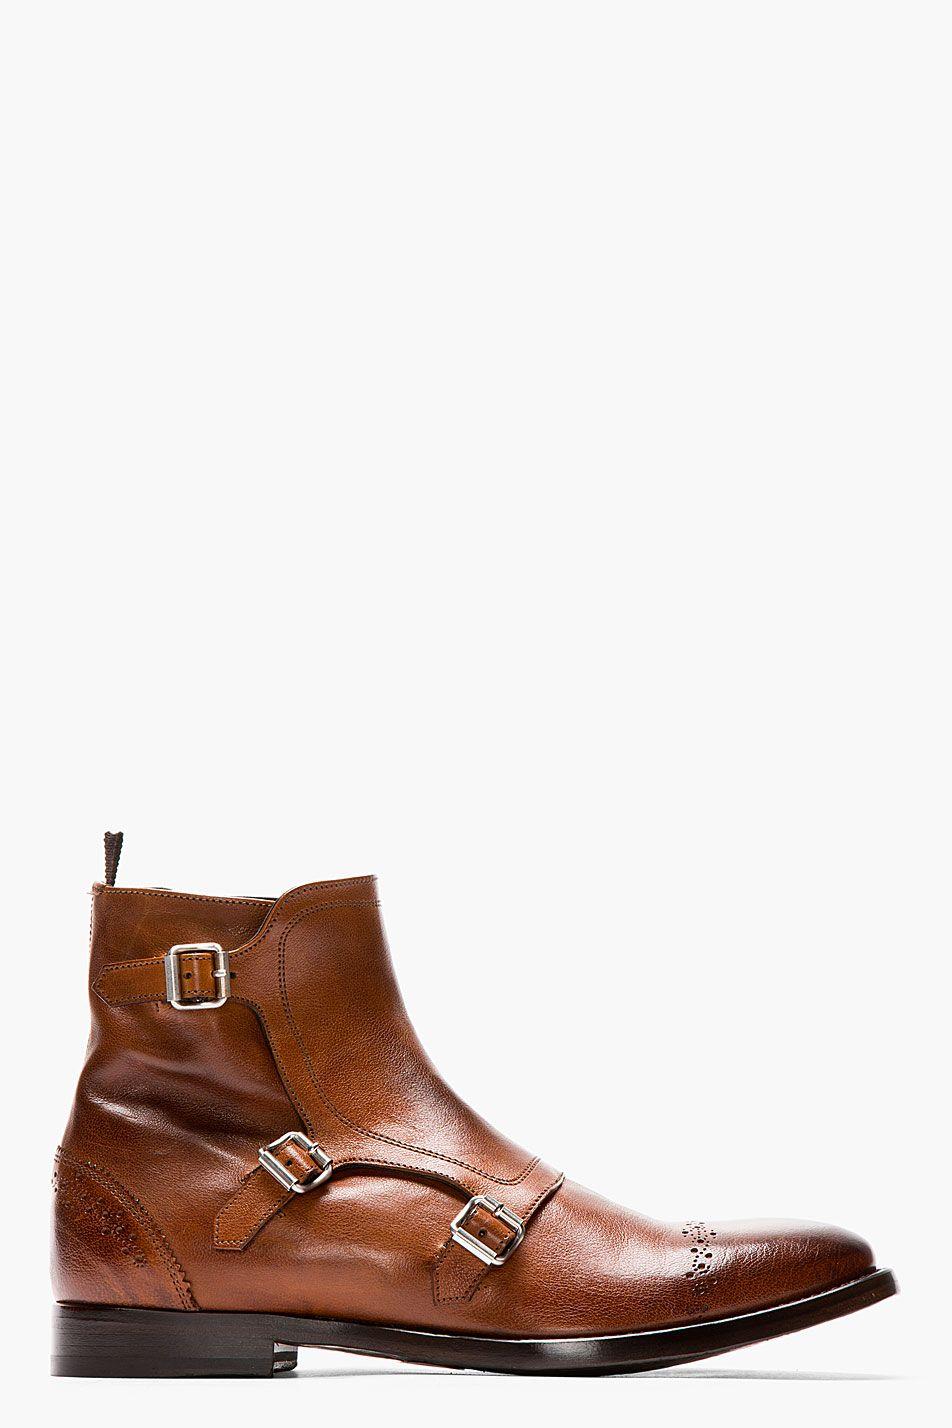 Alexander Mcqueen Boots My Lover Boy Schuhe Schuhe Herren